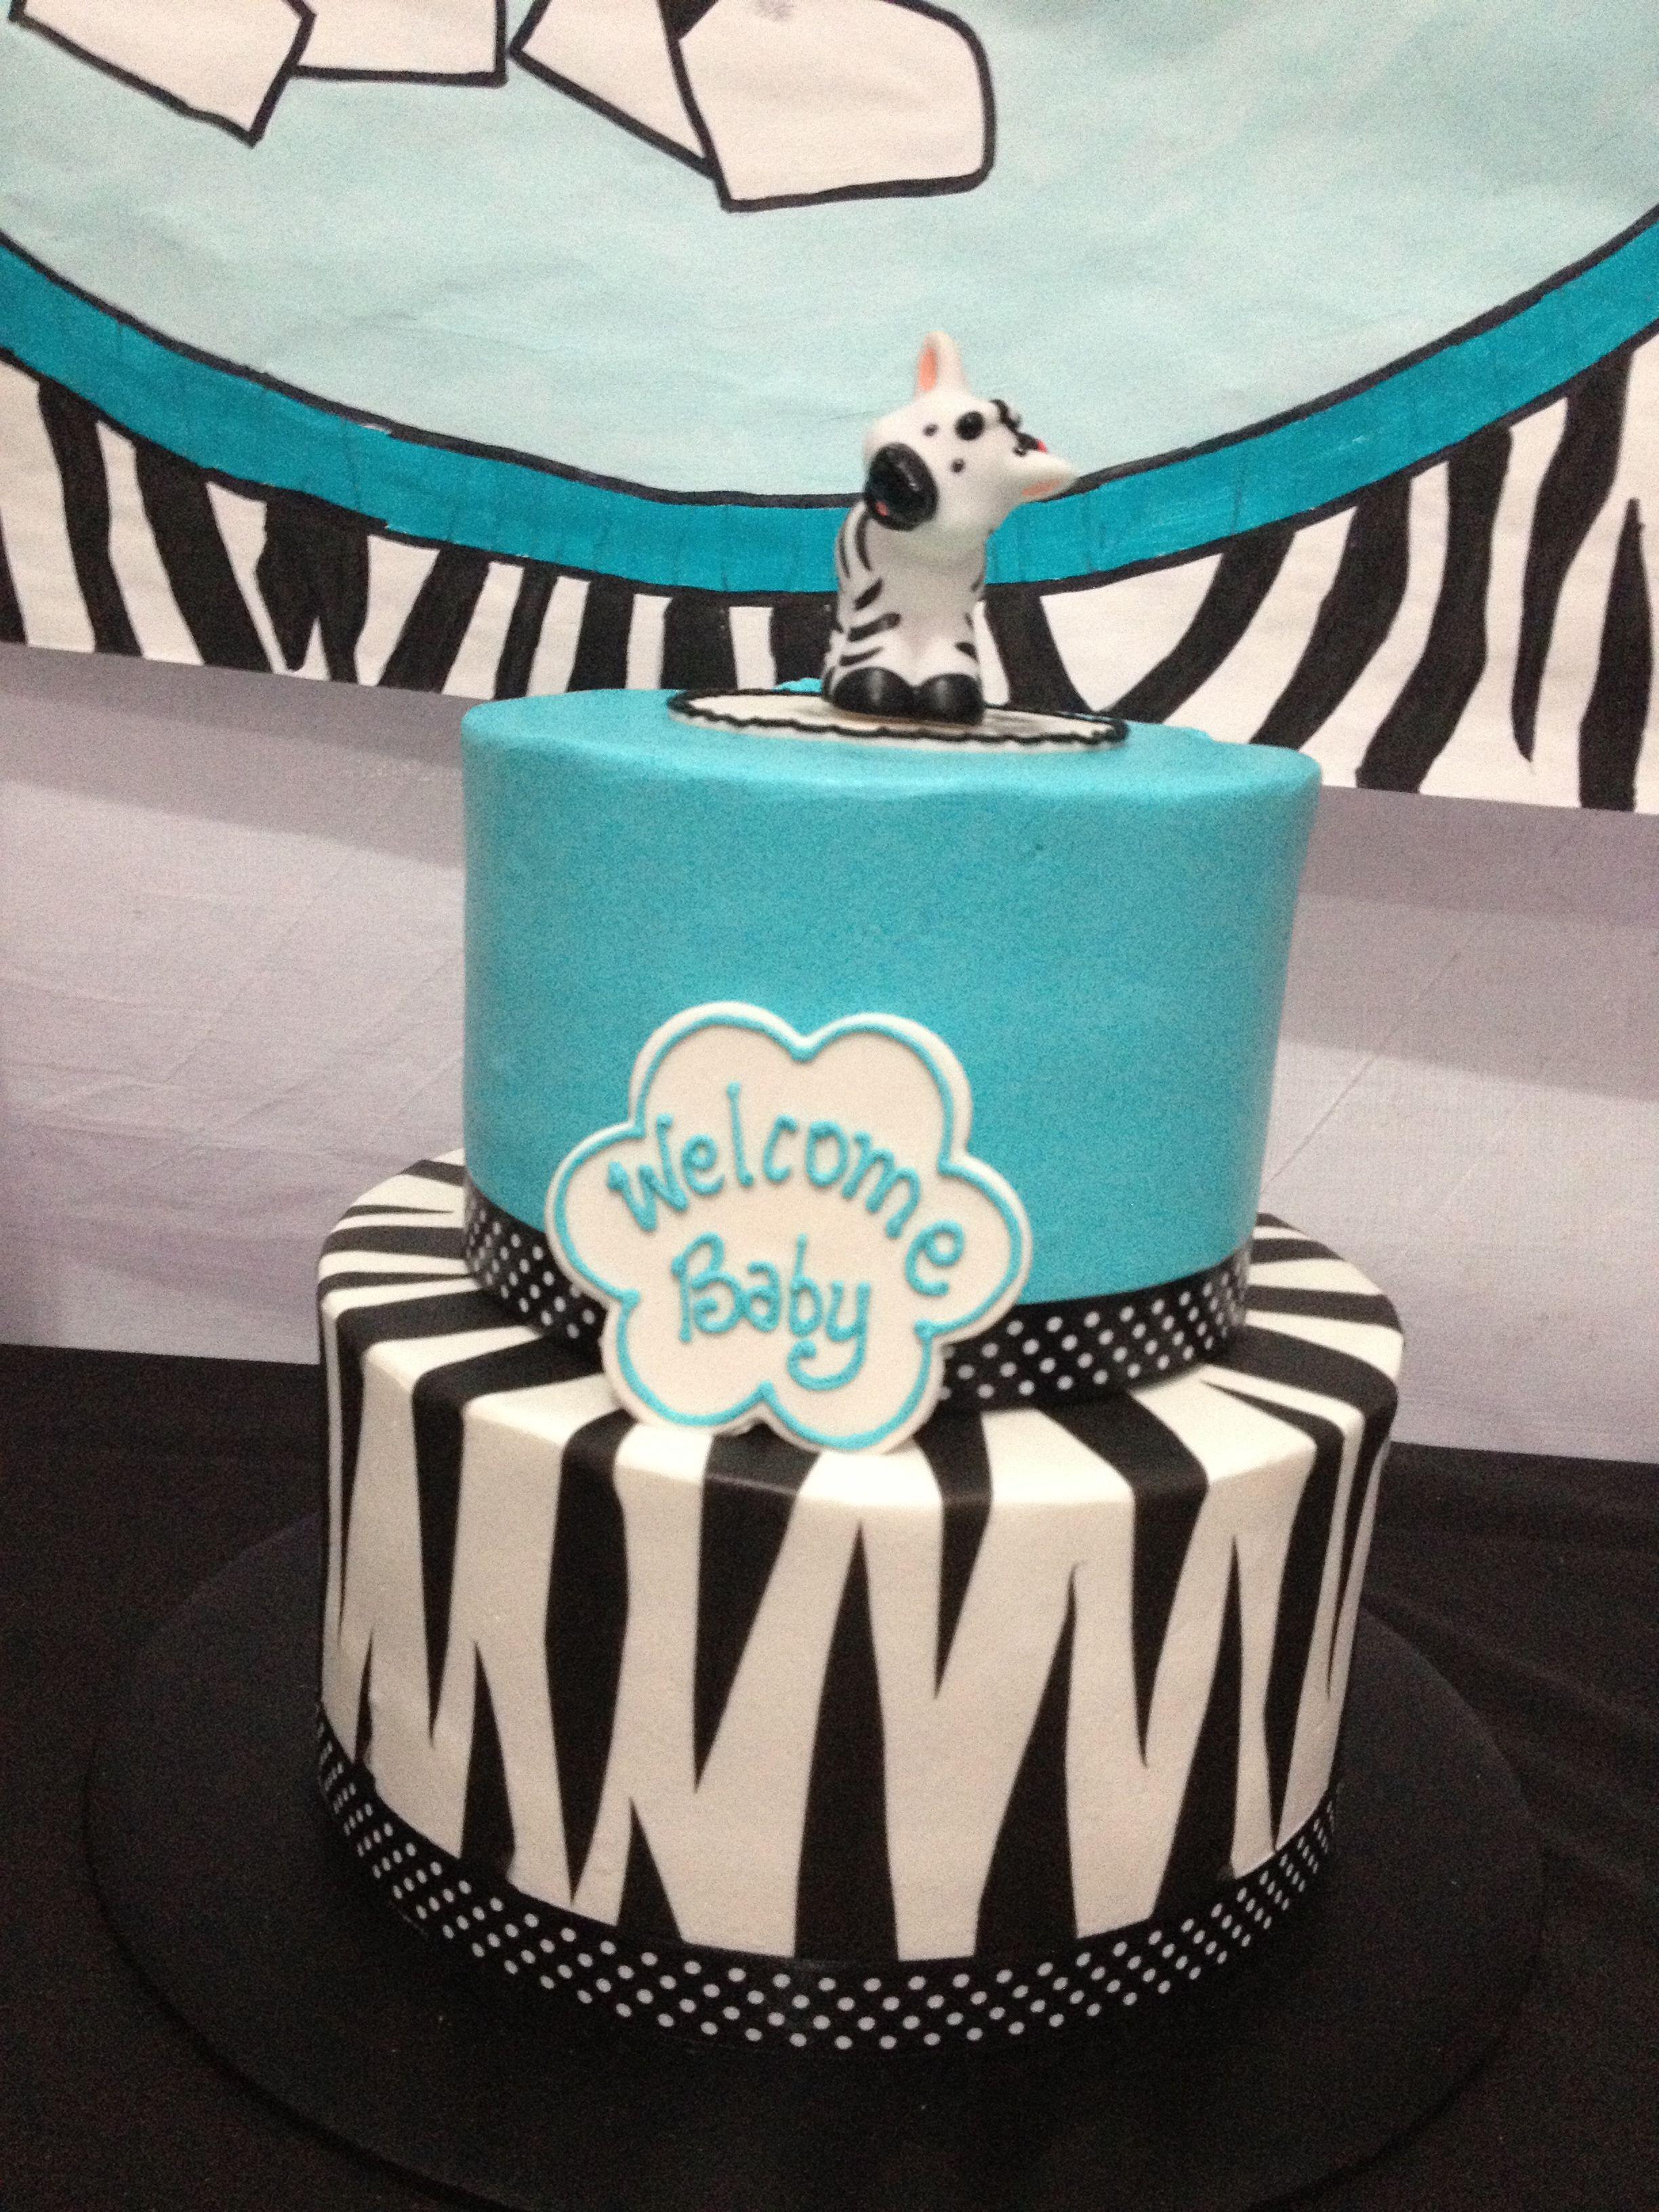 Pin by Maria Alvarez-Bautista on Babyshowers | Baby shower ...